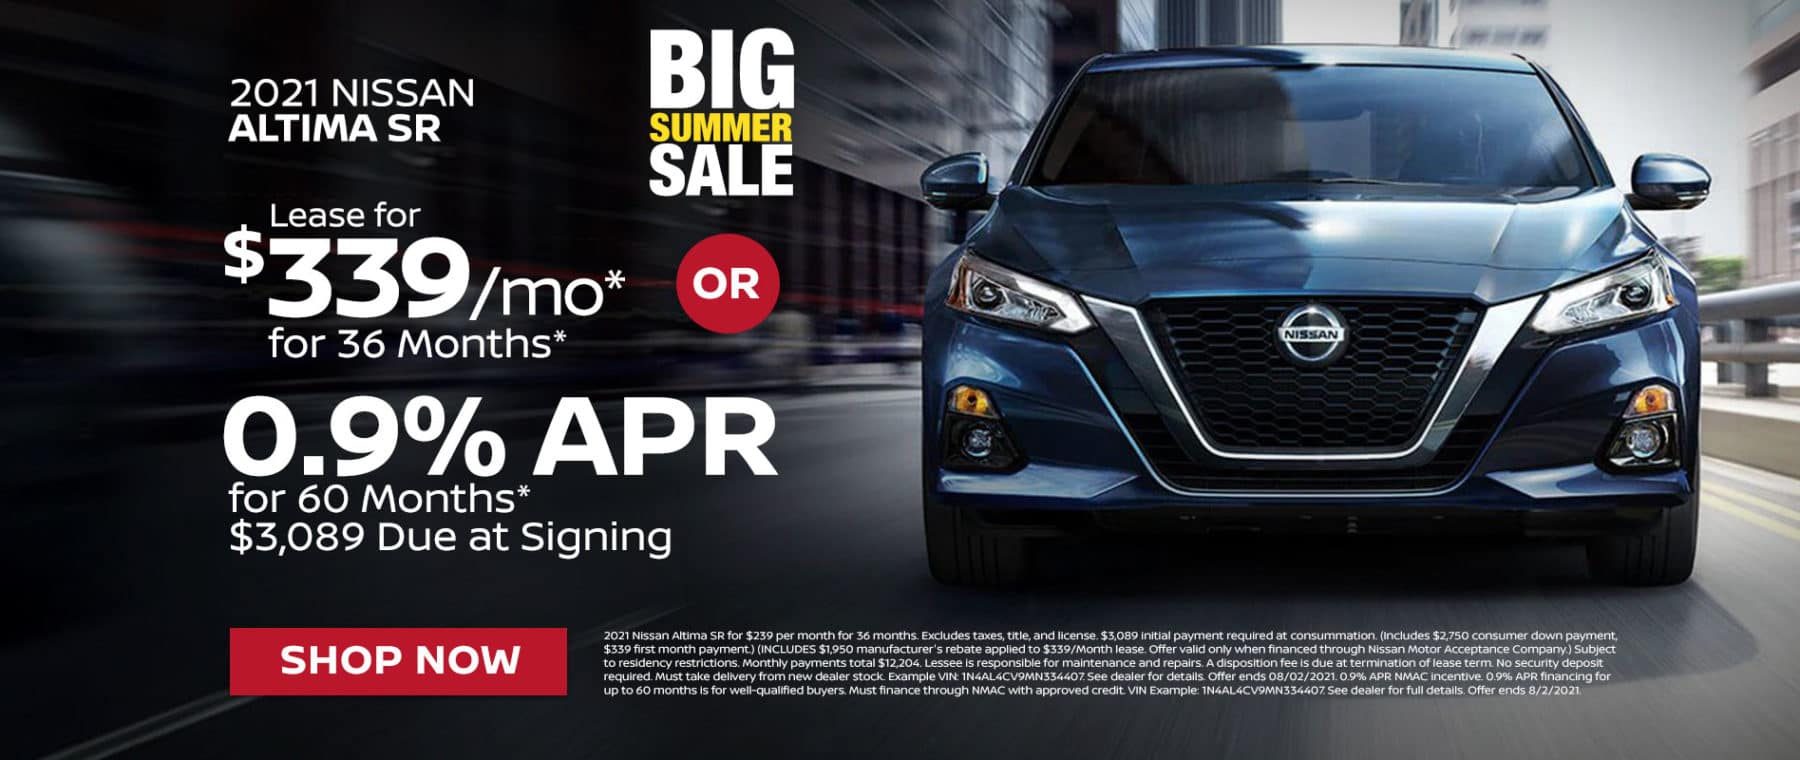 2021 Nissan Altima SR For Sale In Greenville